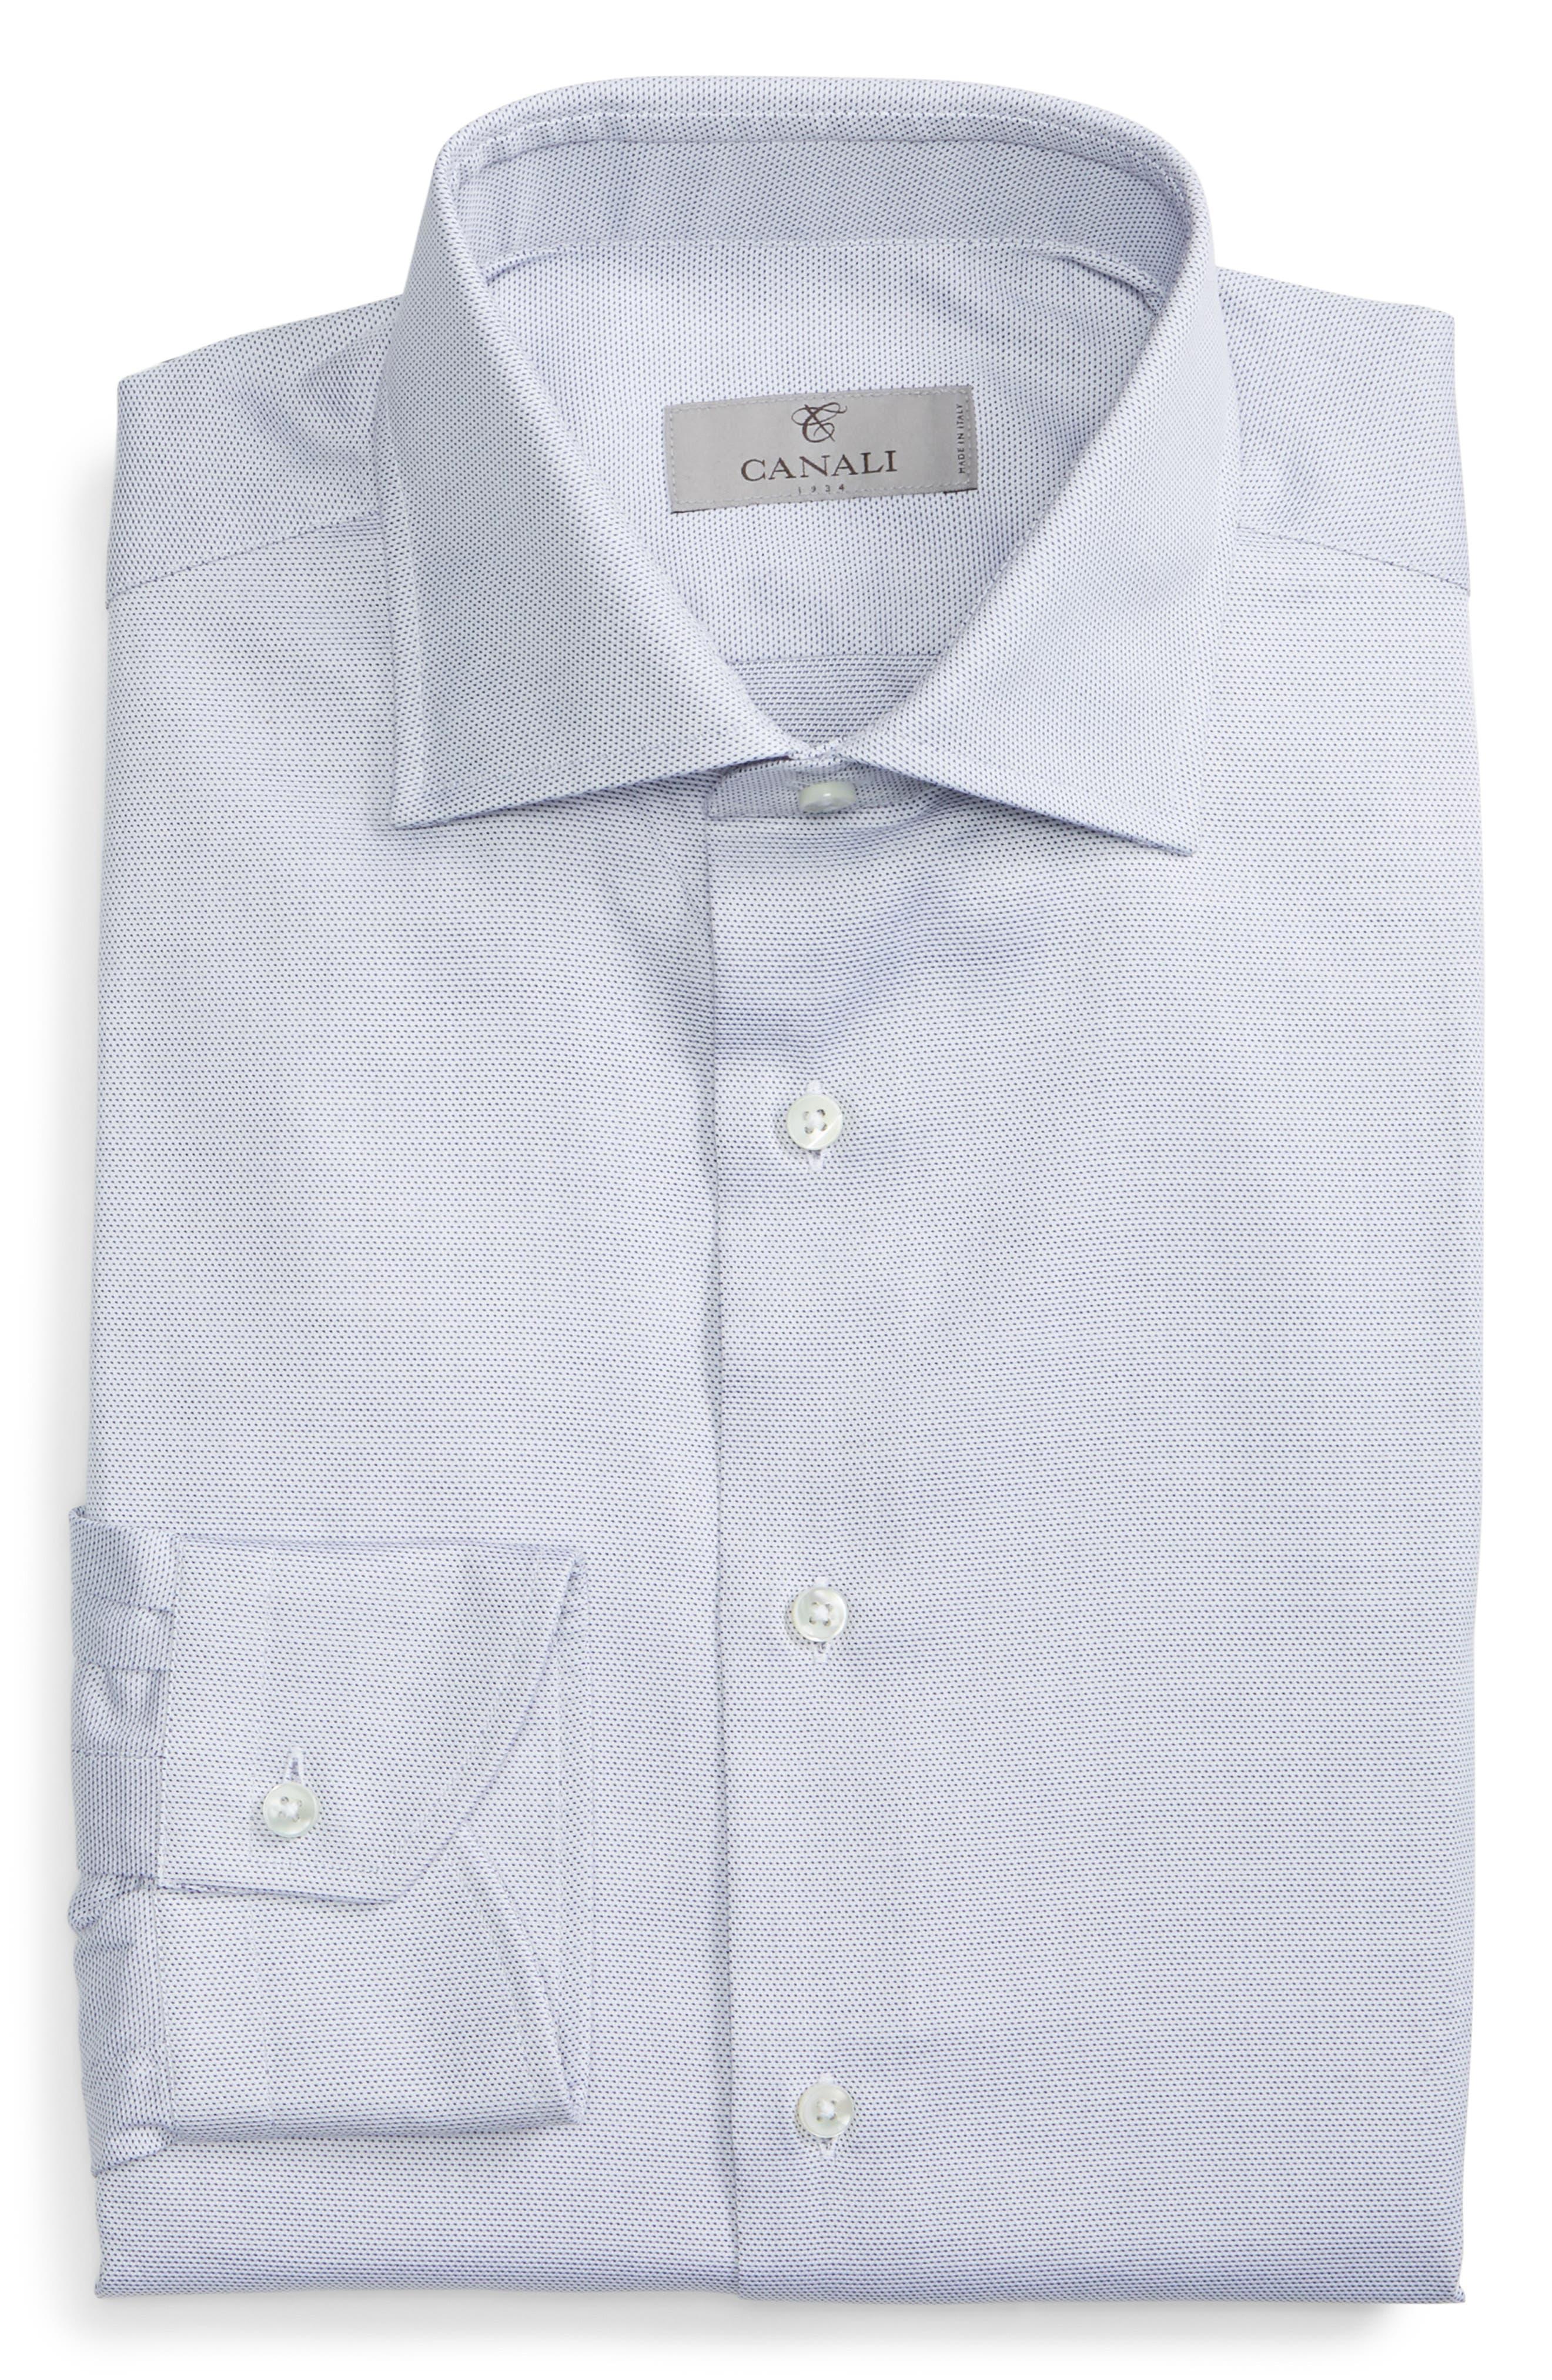 CANALI, Regular Fit Print Dress Shirt, Alternate thumbnail 5, color, GREY